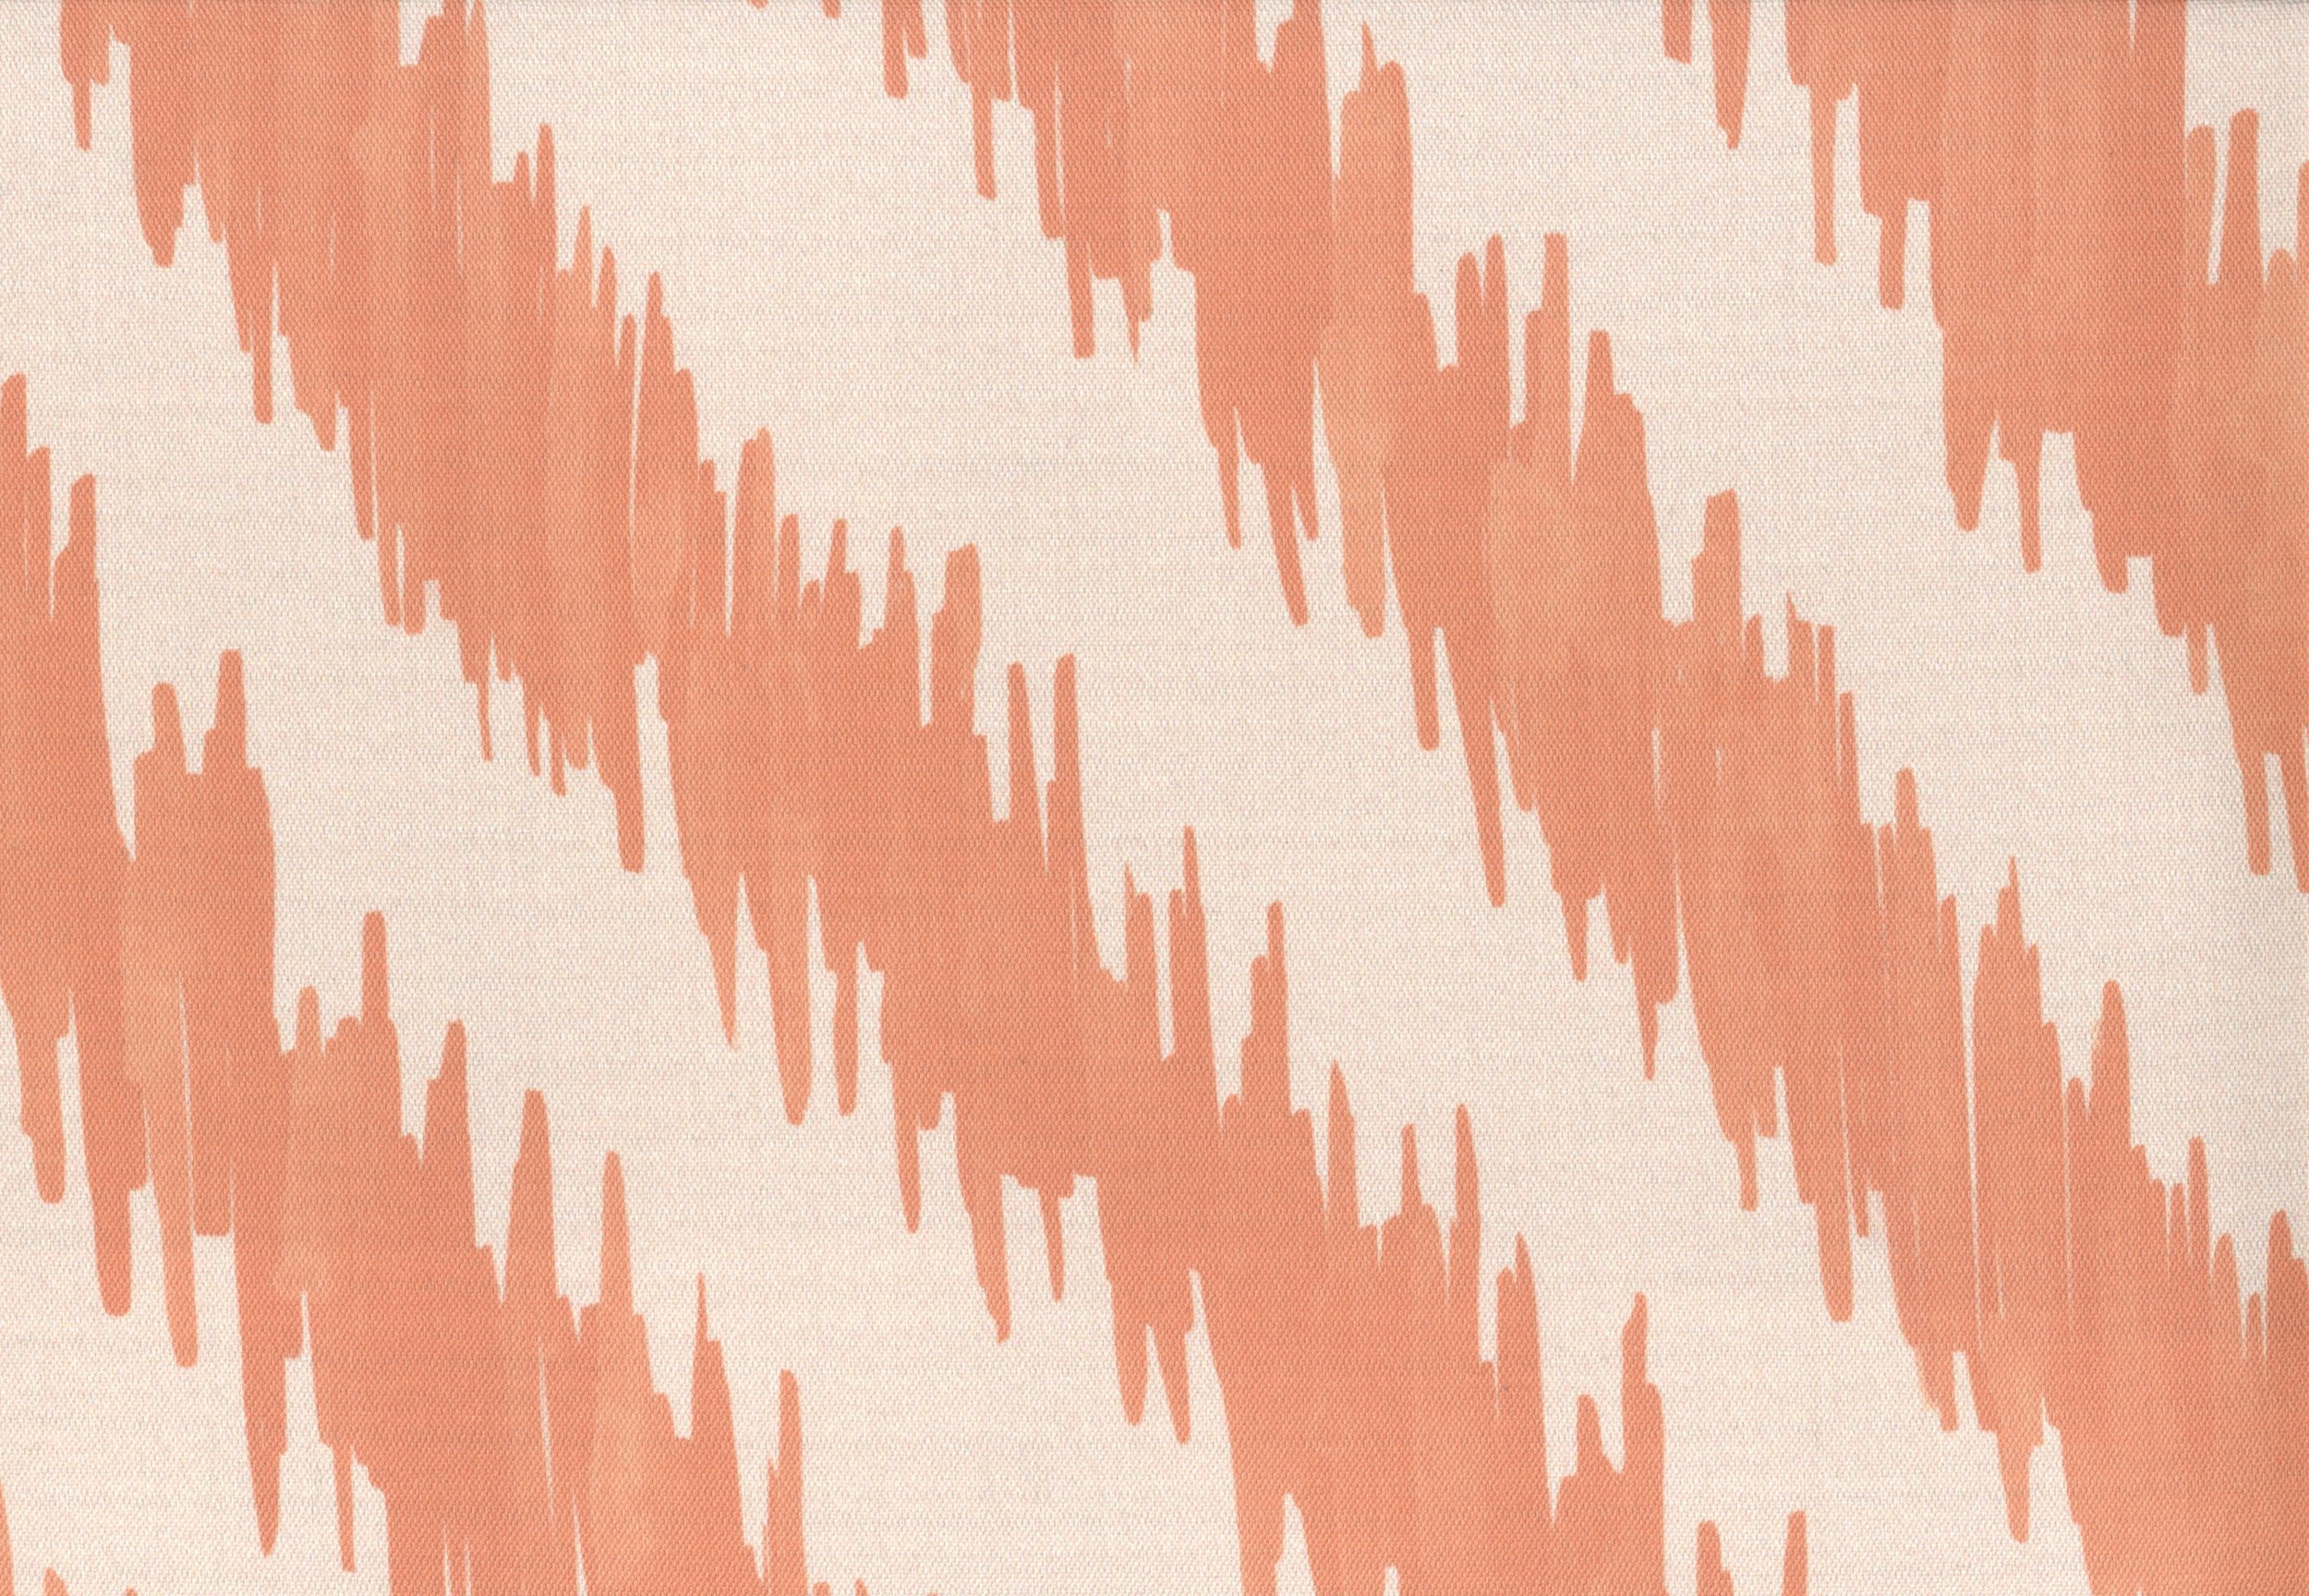 CLOTH & KIND // Interior Design for Your Desktop, Kate Loudoun Shand